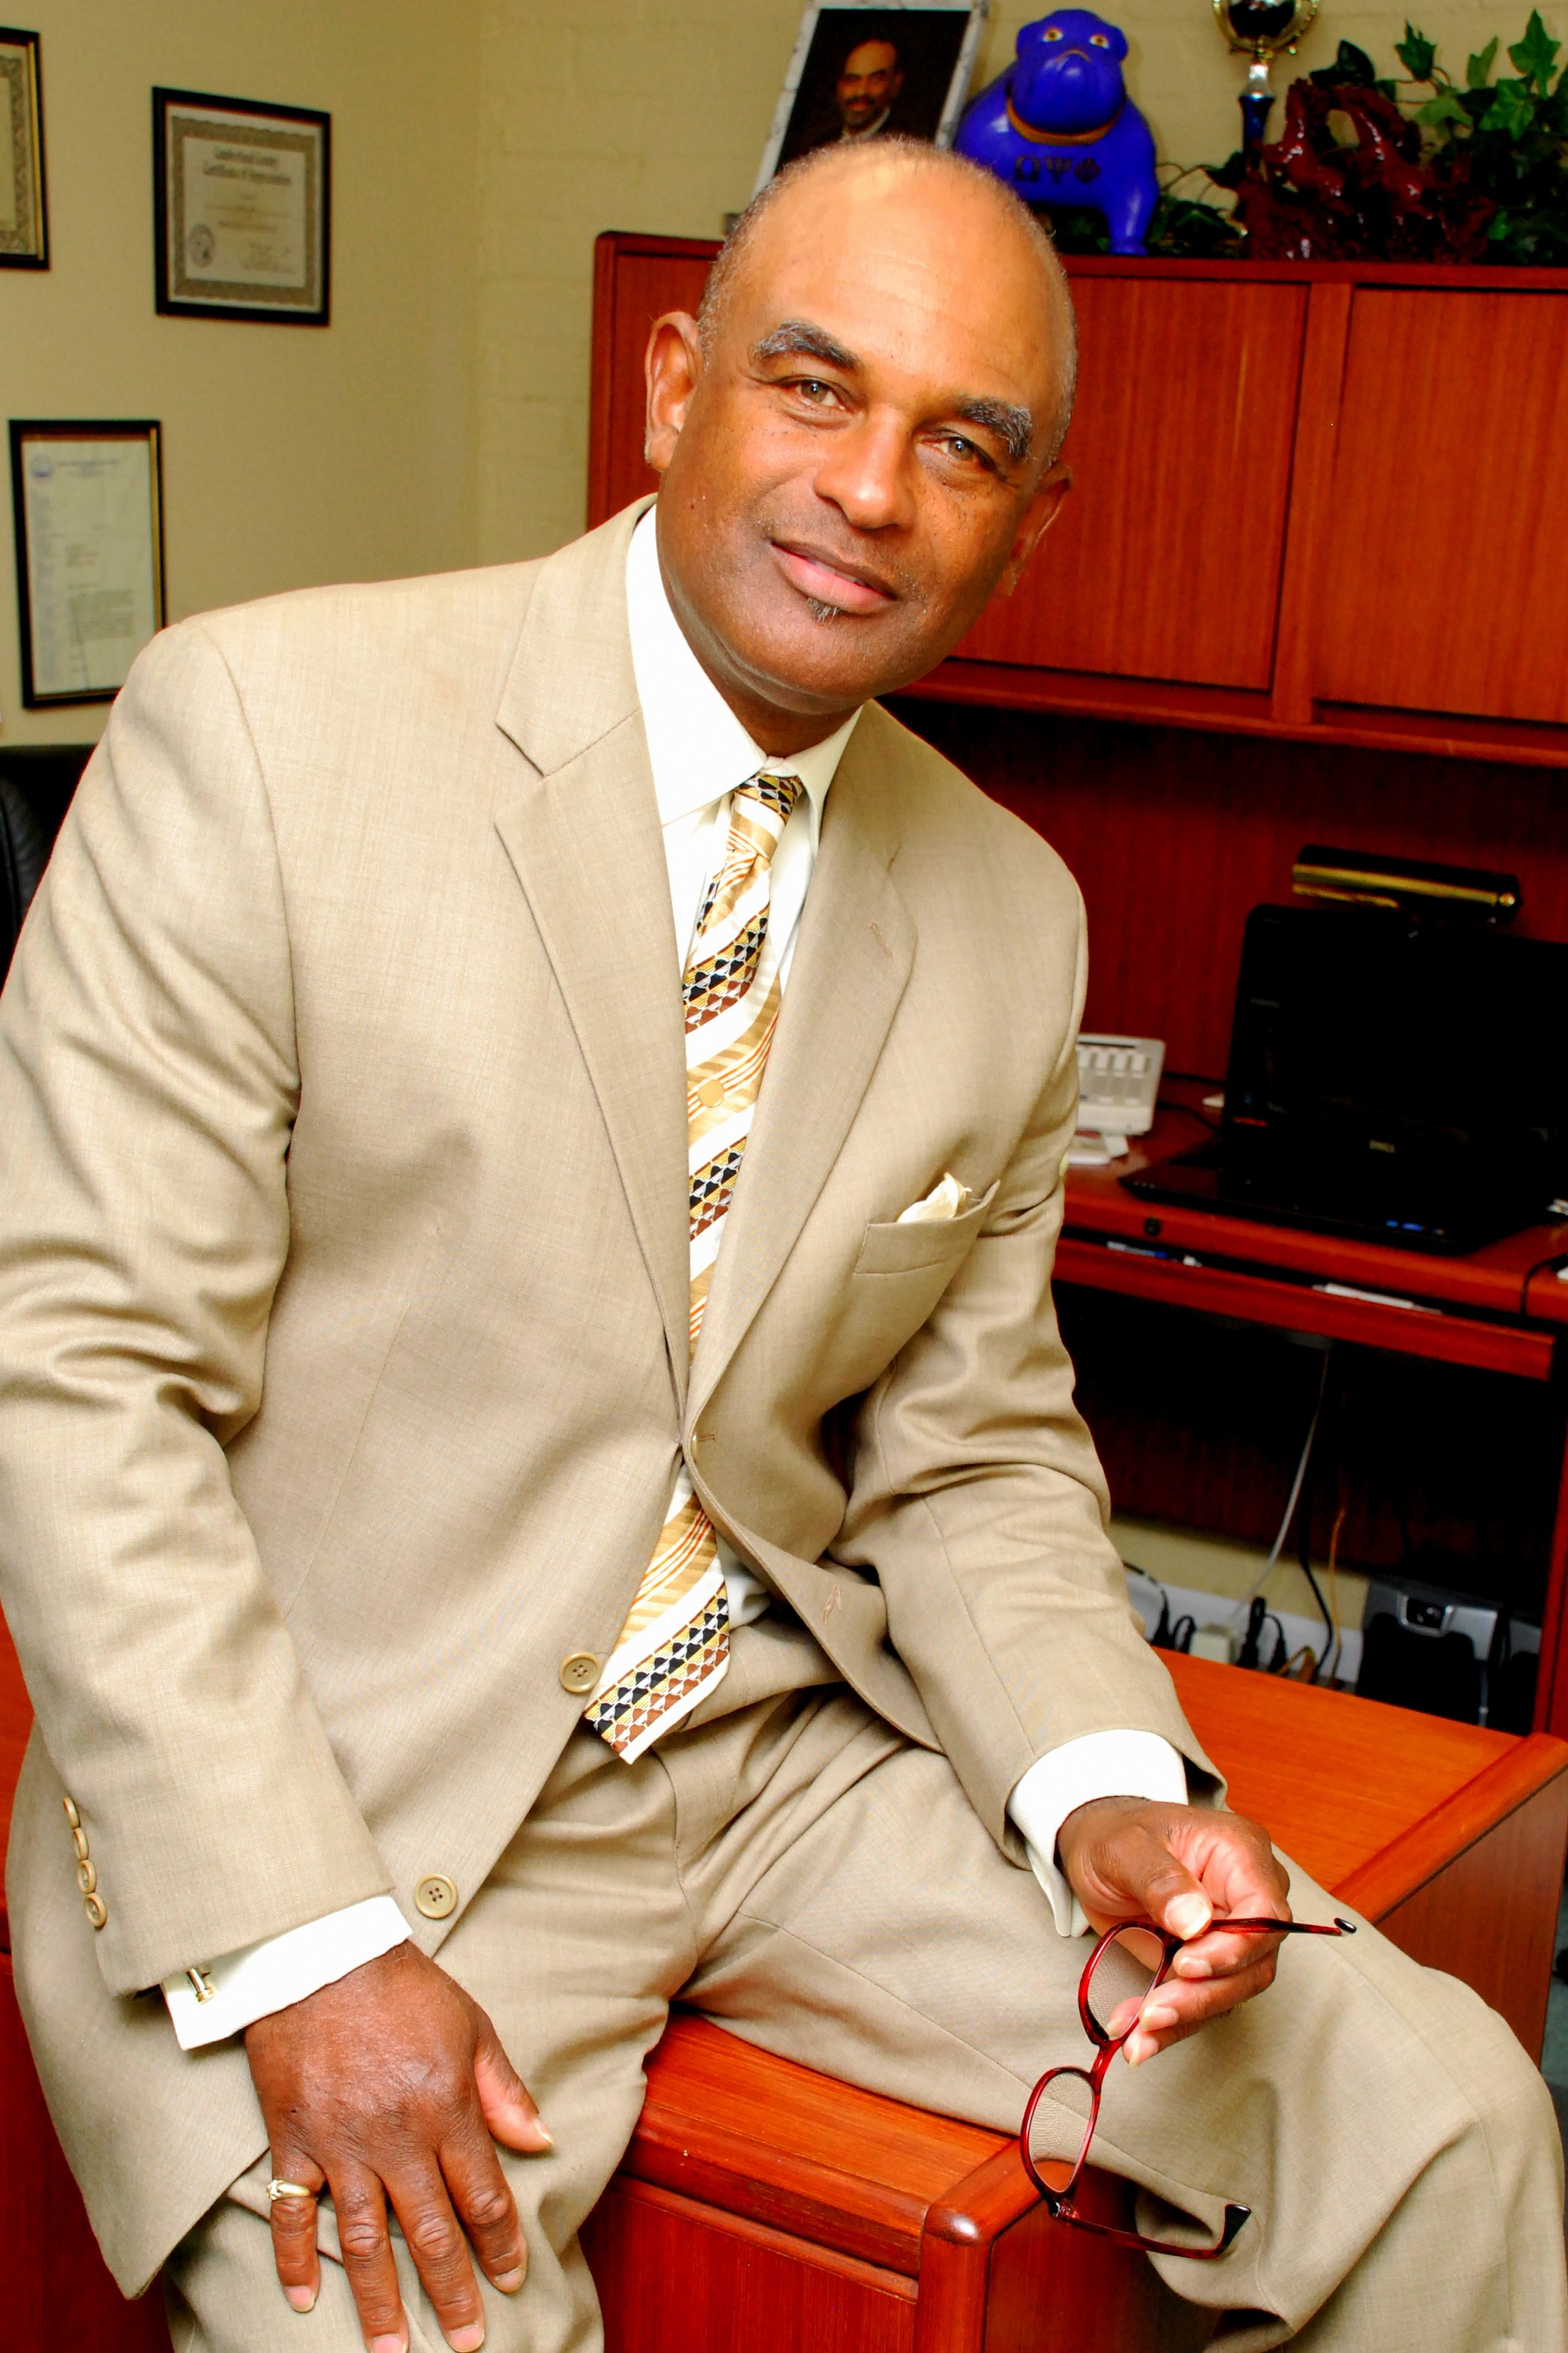 Pastor Joshua J. Haire